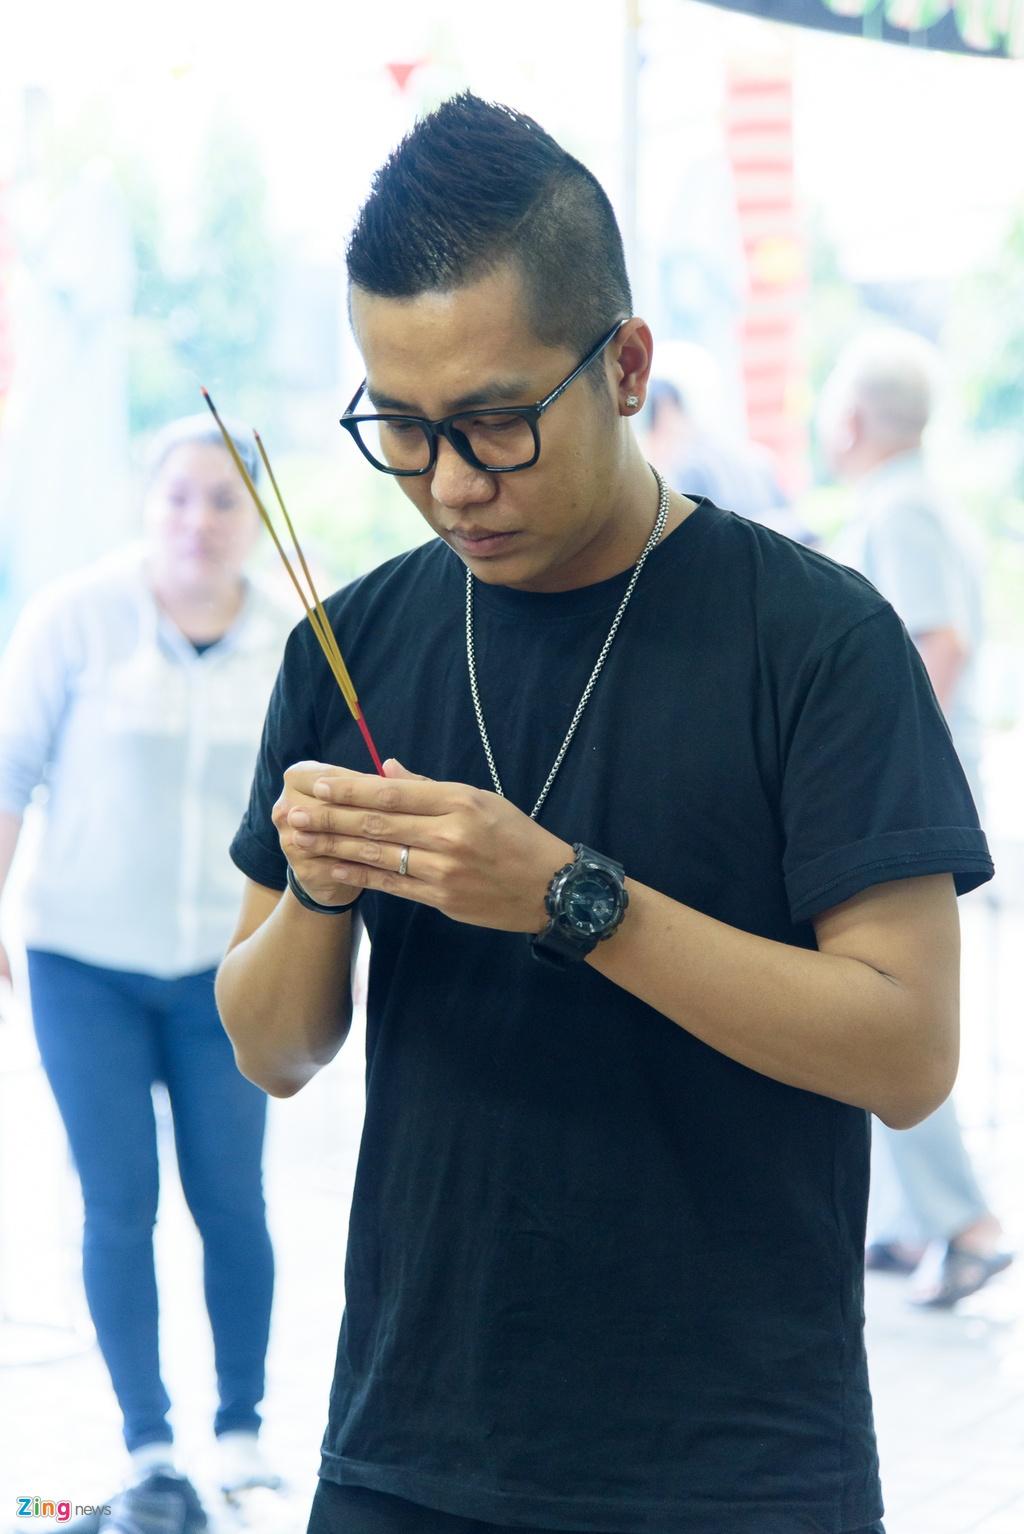 Quyen Linh, Phuong Thanh vieng dien vien Nguyen Hau vao ngay 29 Tet hinh anh 8